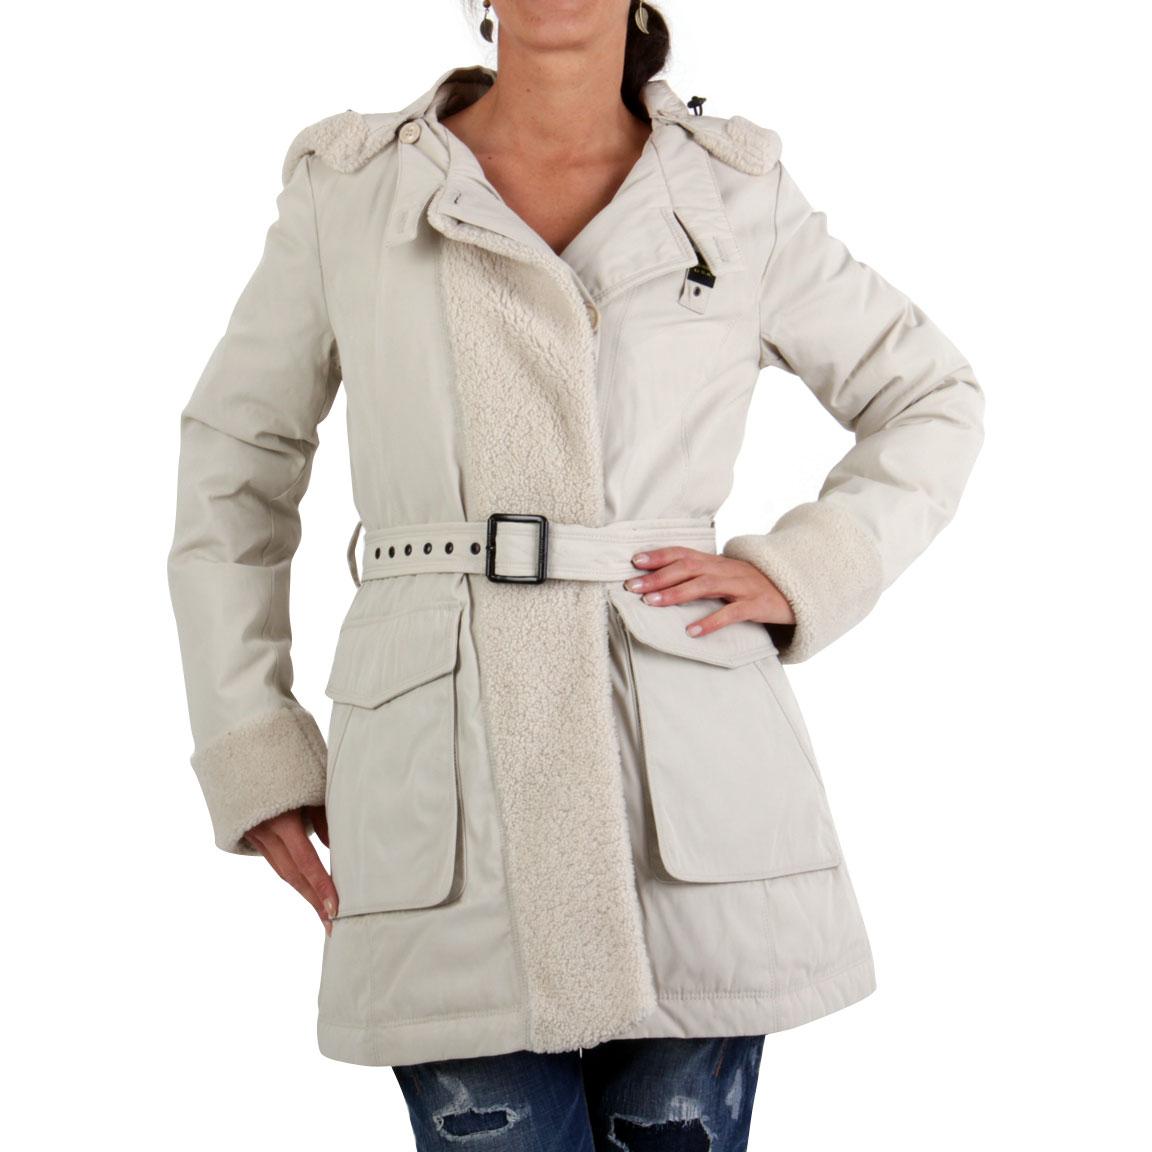 blauer usa damen winter daunen parka mantel jacke beige bld0300 gr e s ebay. Black Bedroom Furniture Sets. Home Design Ideas